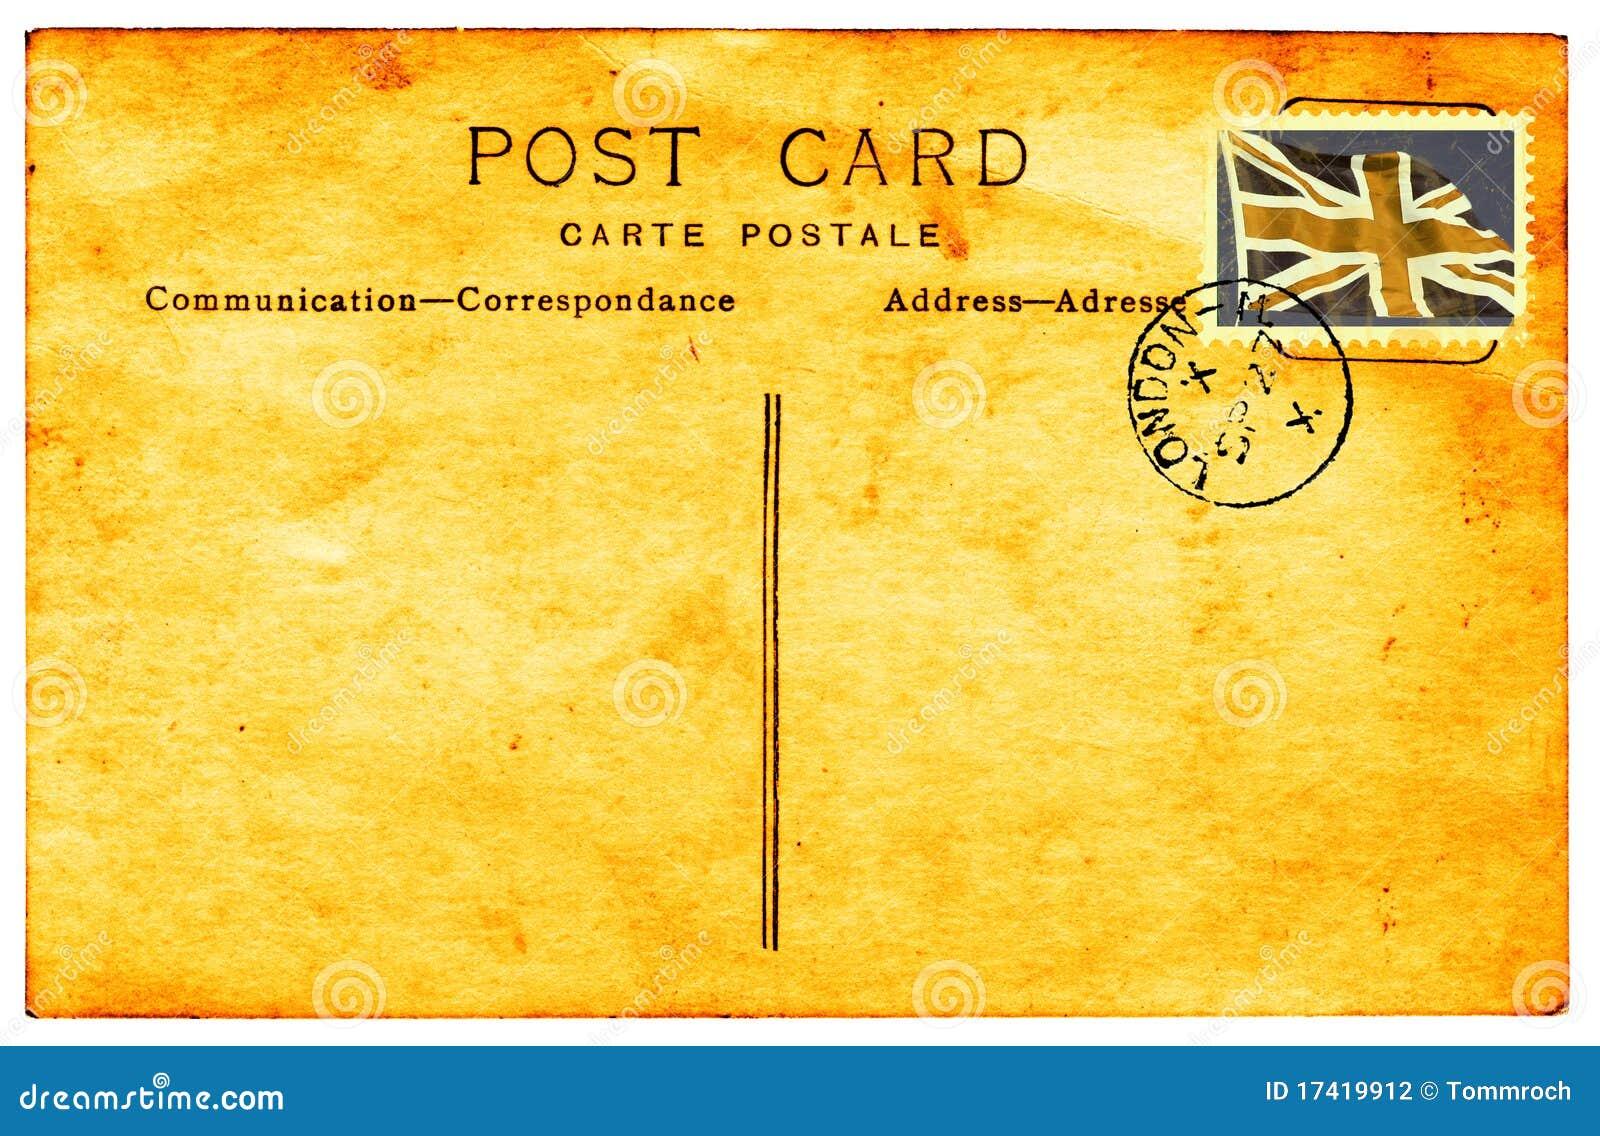 Populaire Carte Postale Des Anglais De Cru Image stock - Image: 1297421 KL44